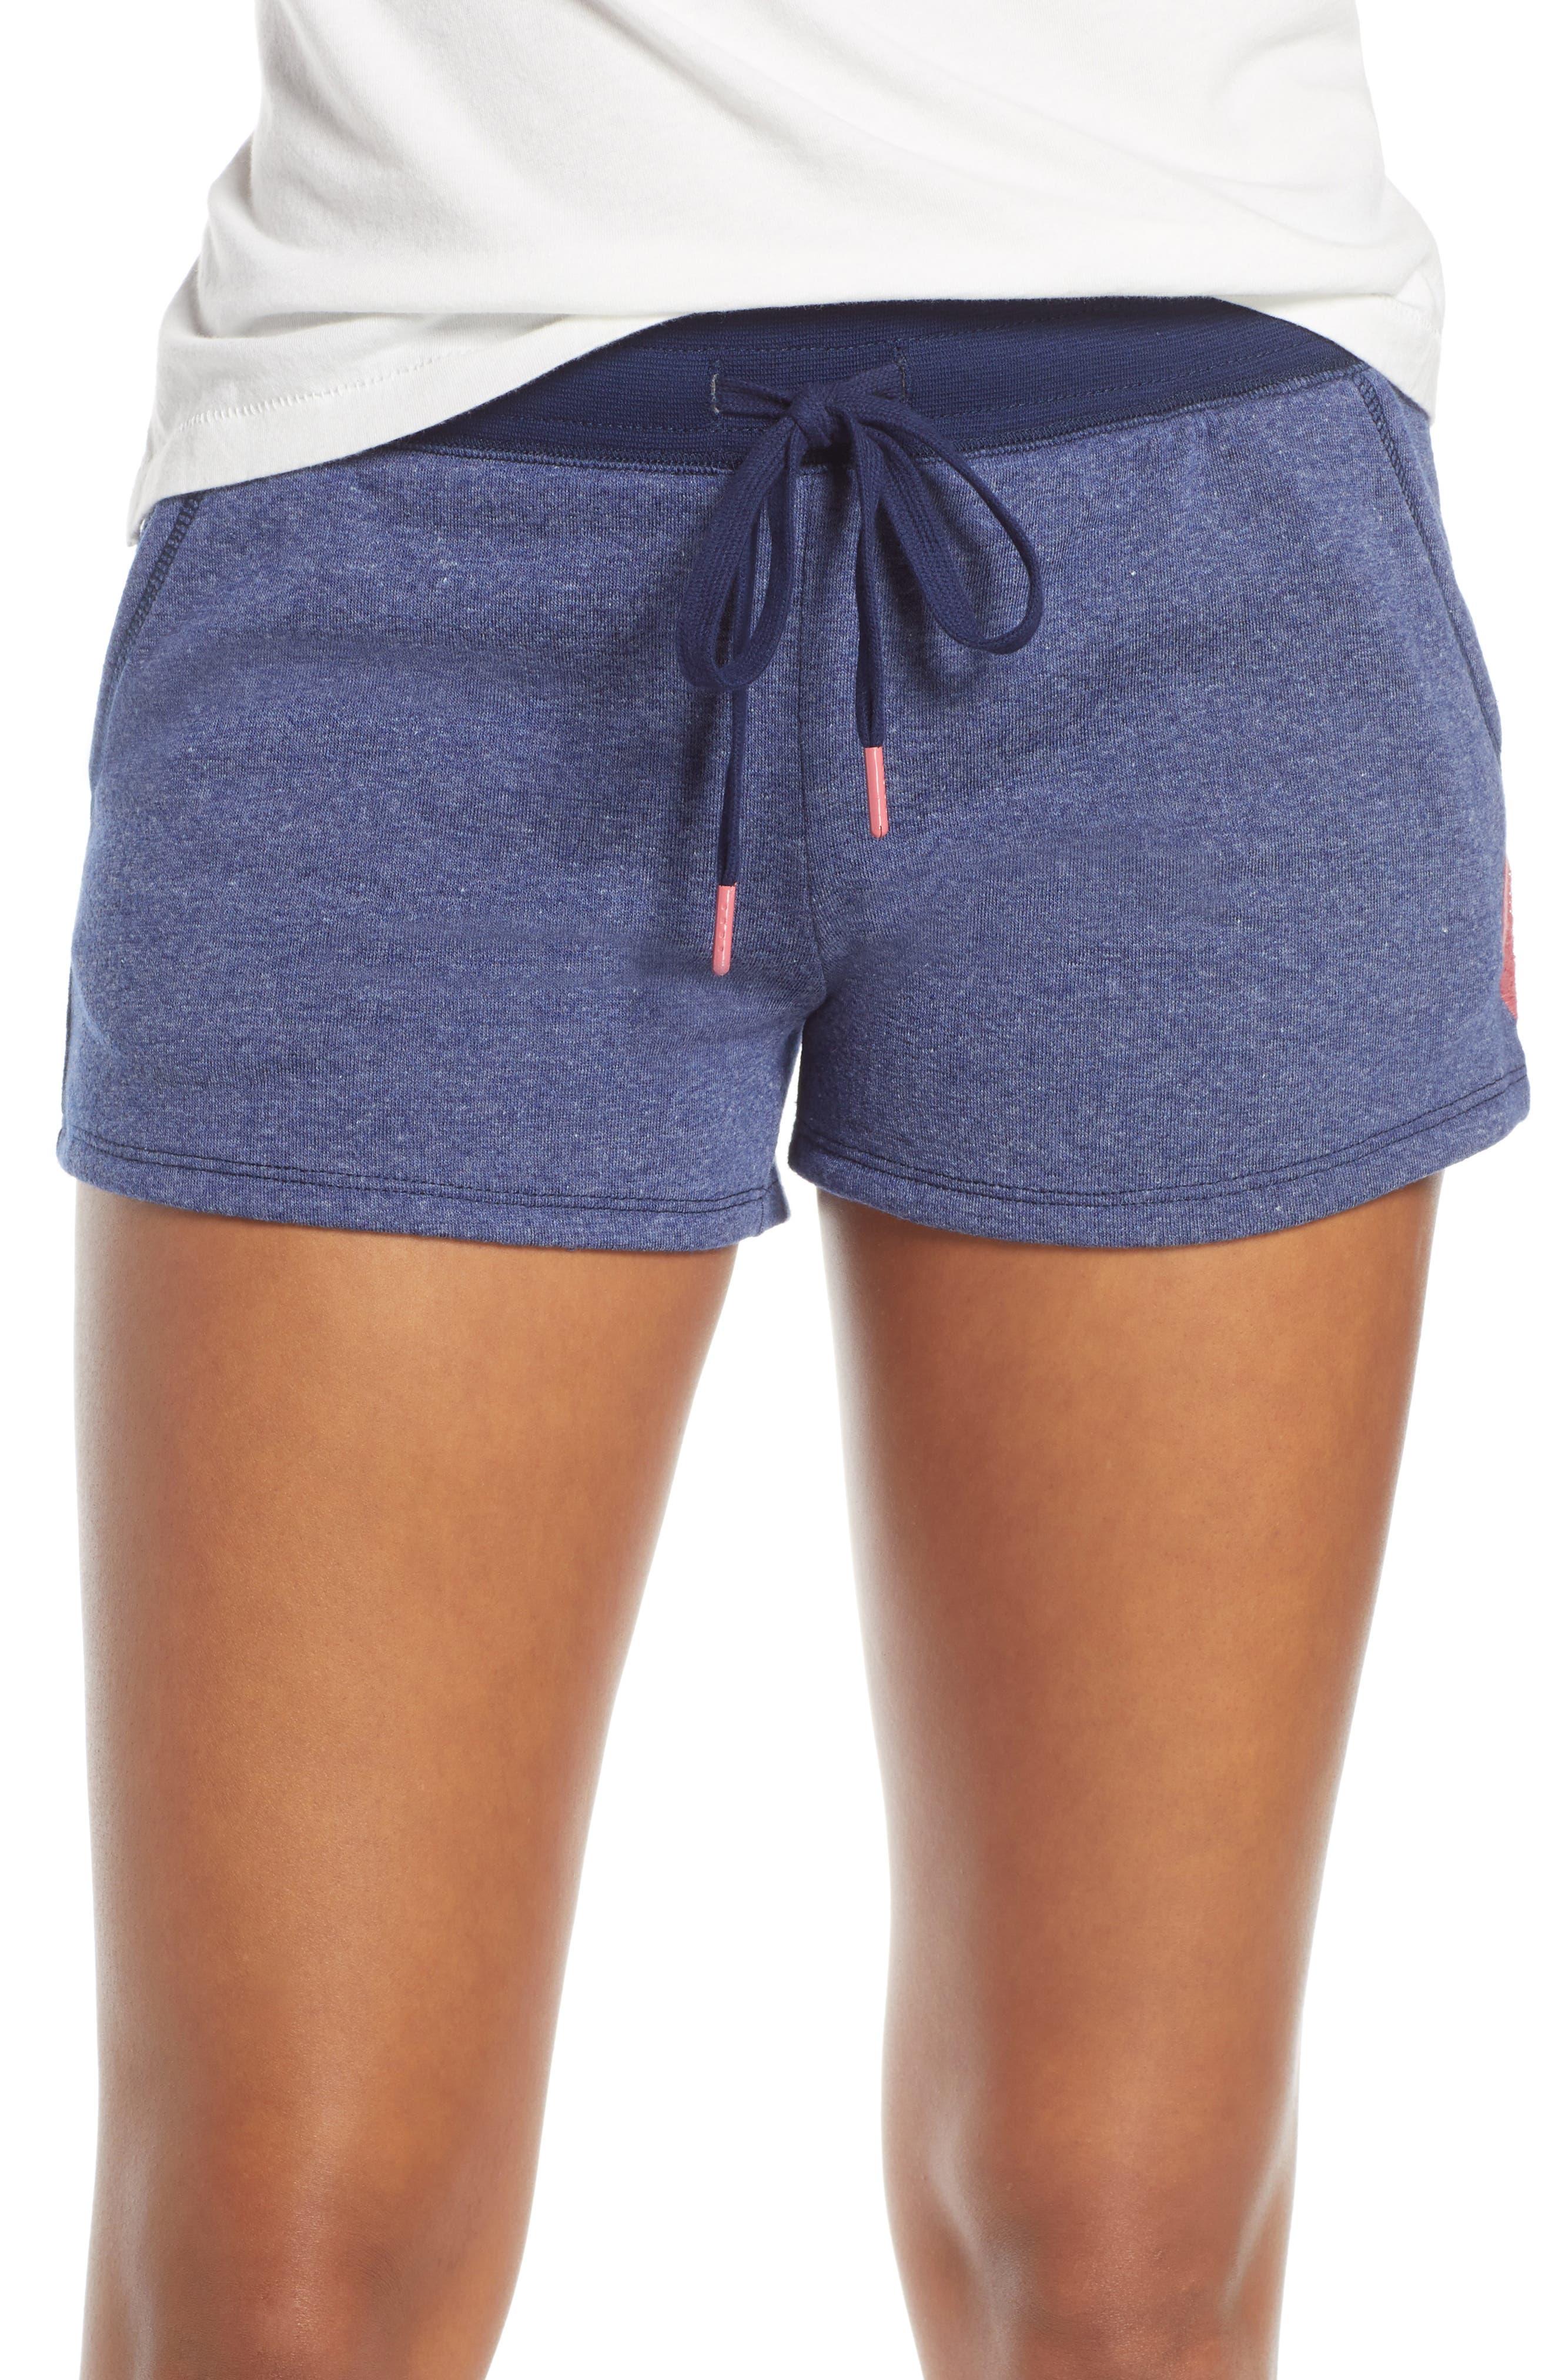 Pj Salvage Sundaze Pajama Shorts, Blue